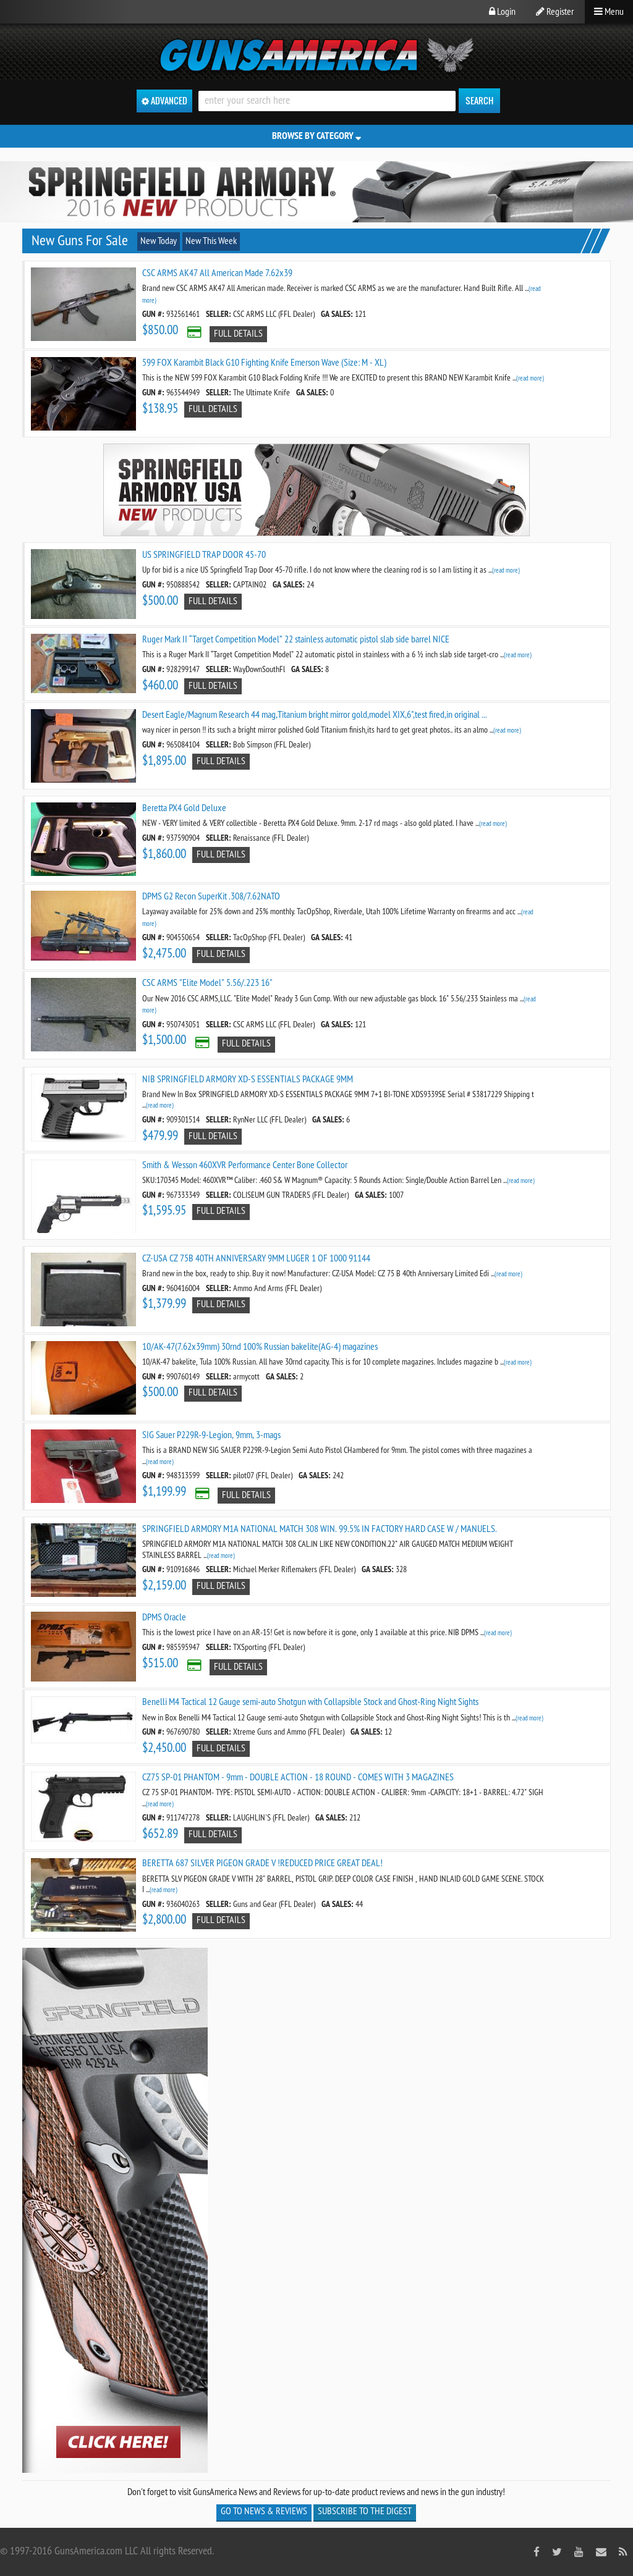 GunsAmerica Competitors, Revenue and Employees - Owler